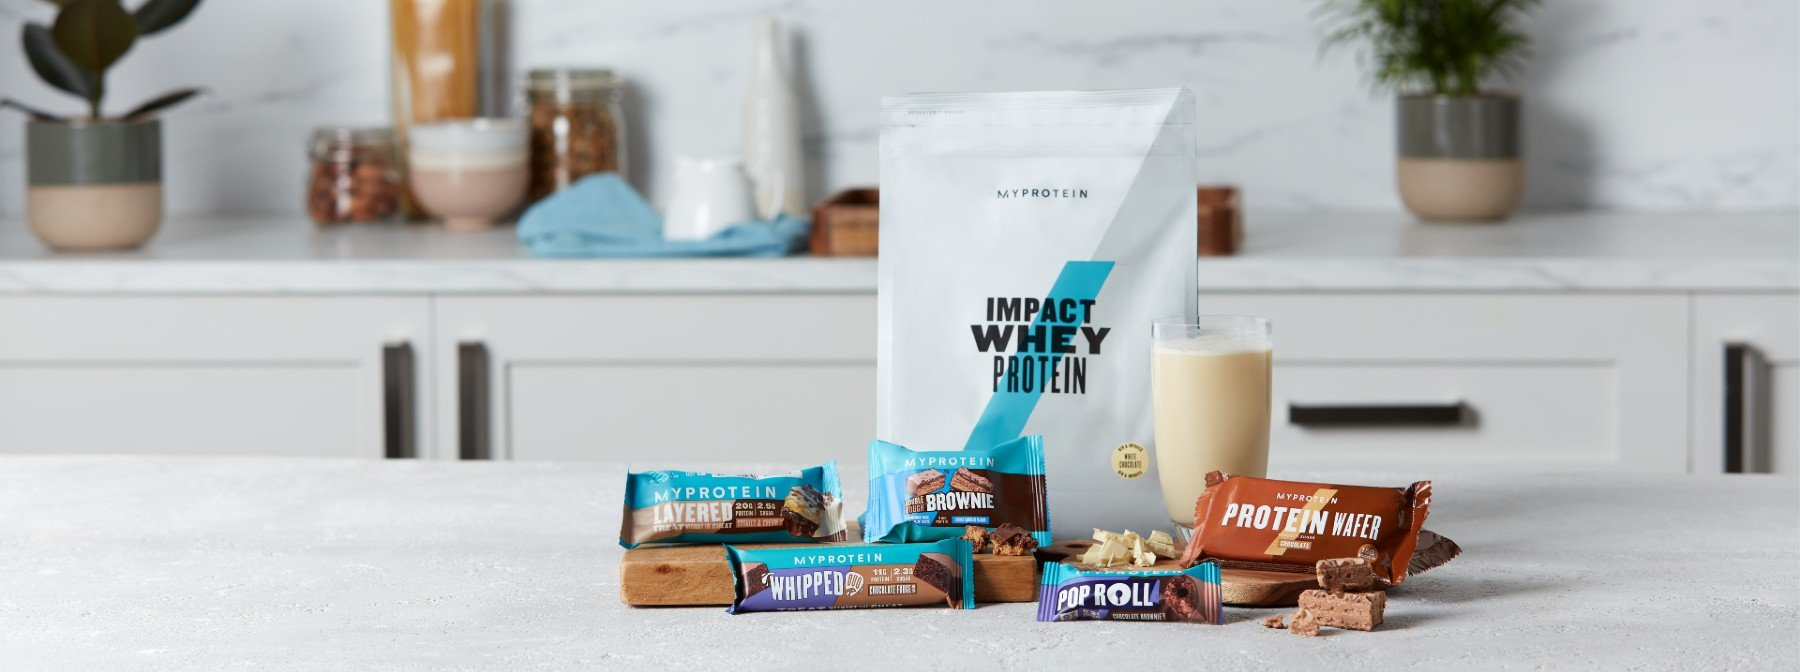 Stille an diesem Ostern deinen Hunger nach Süßem & decke deinen Makronährstoffbdarf | Entdecke unsere Oster-Box